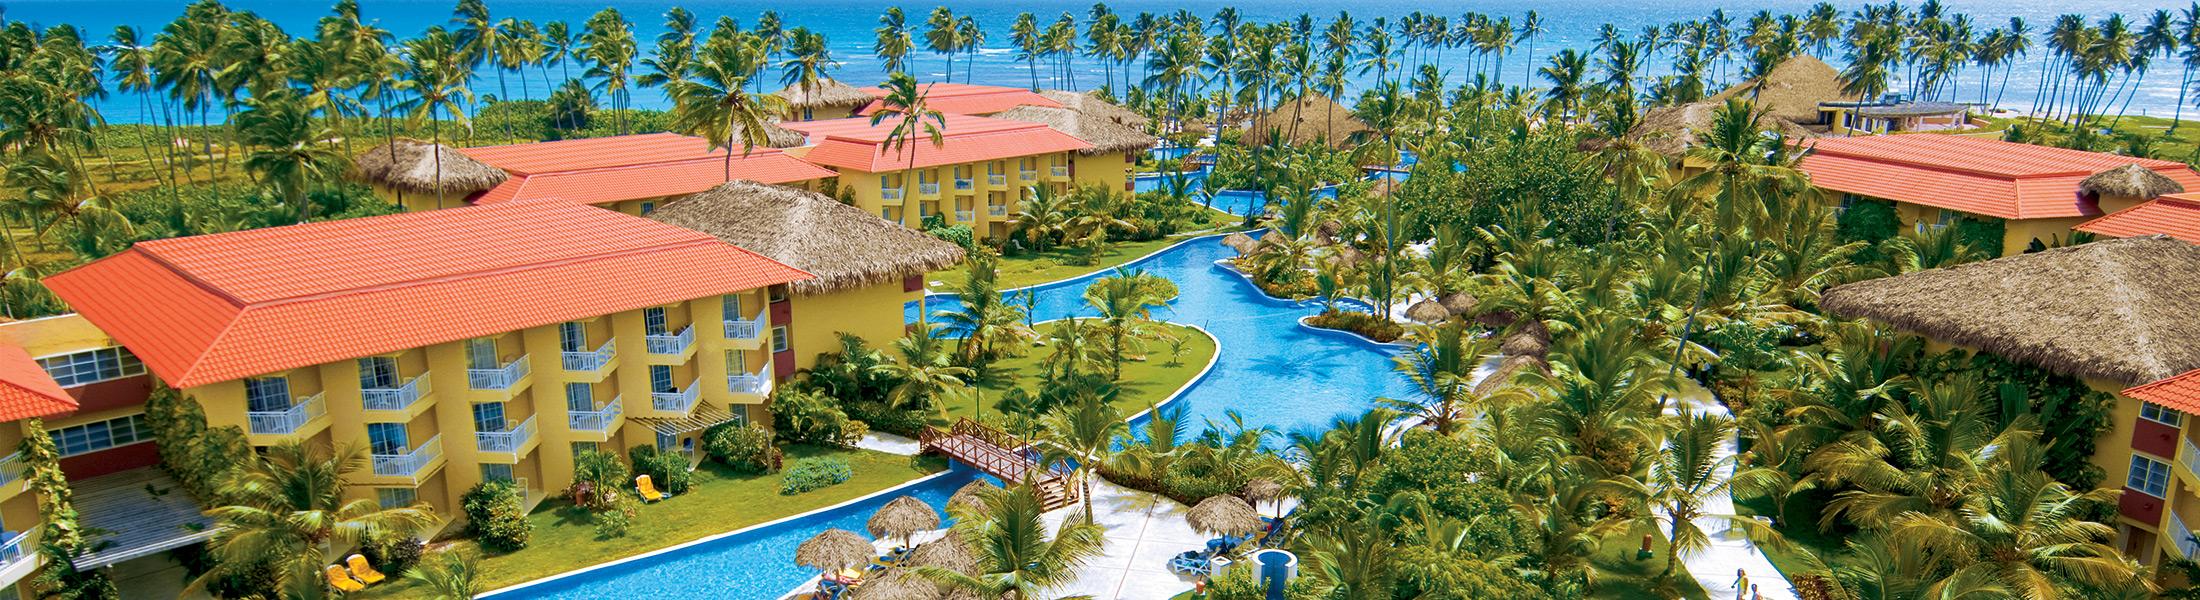 Aerial view of Dreams Punta Cana